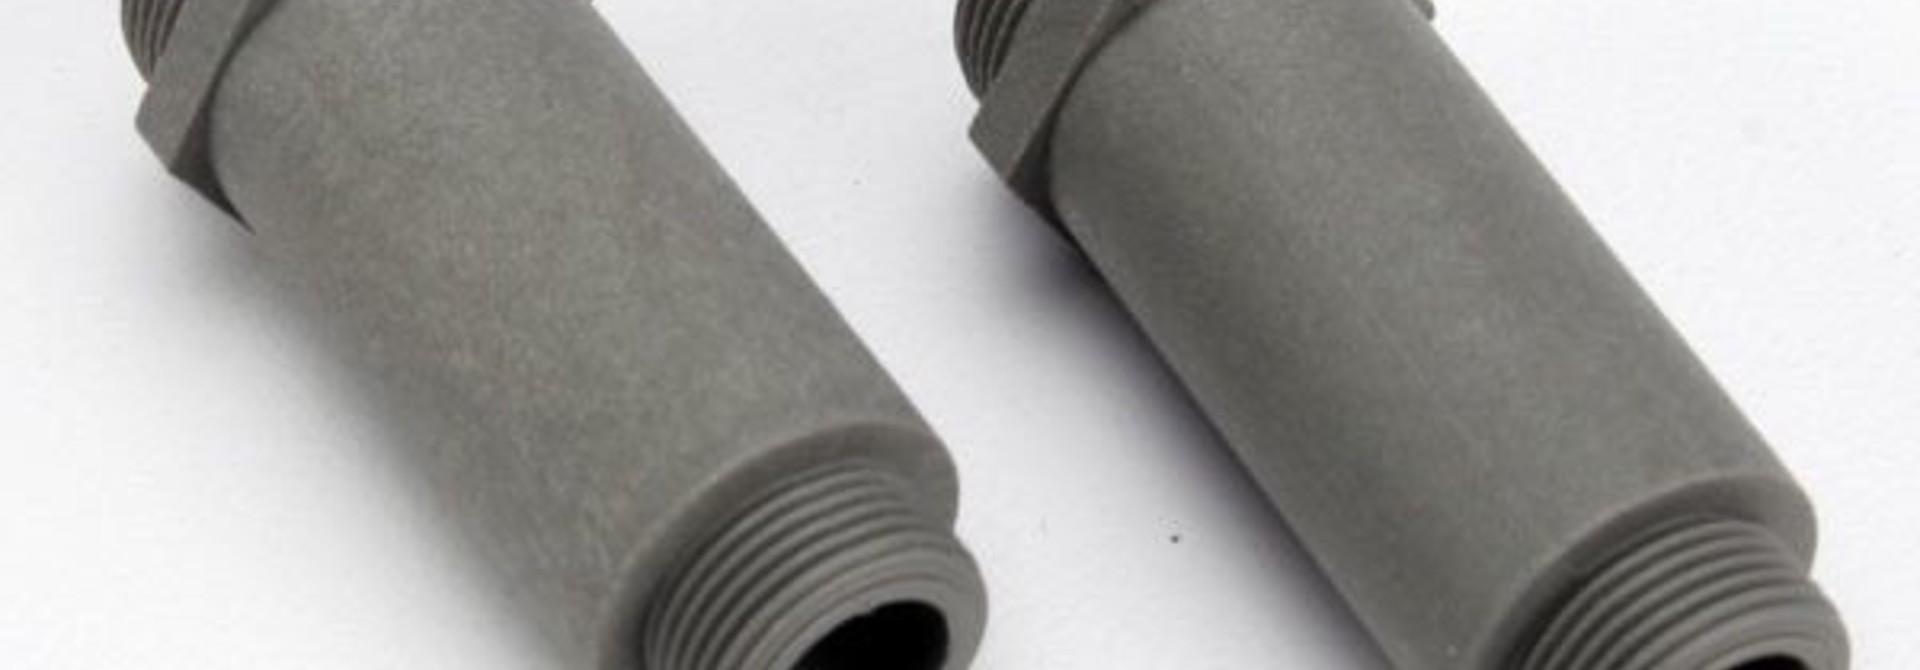 Body, Ultra Shock(s) (long) (grey) (2), TRX3765A